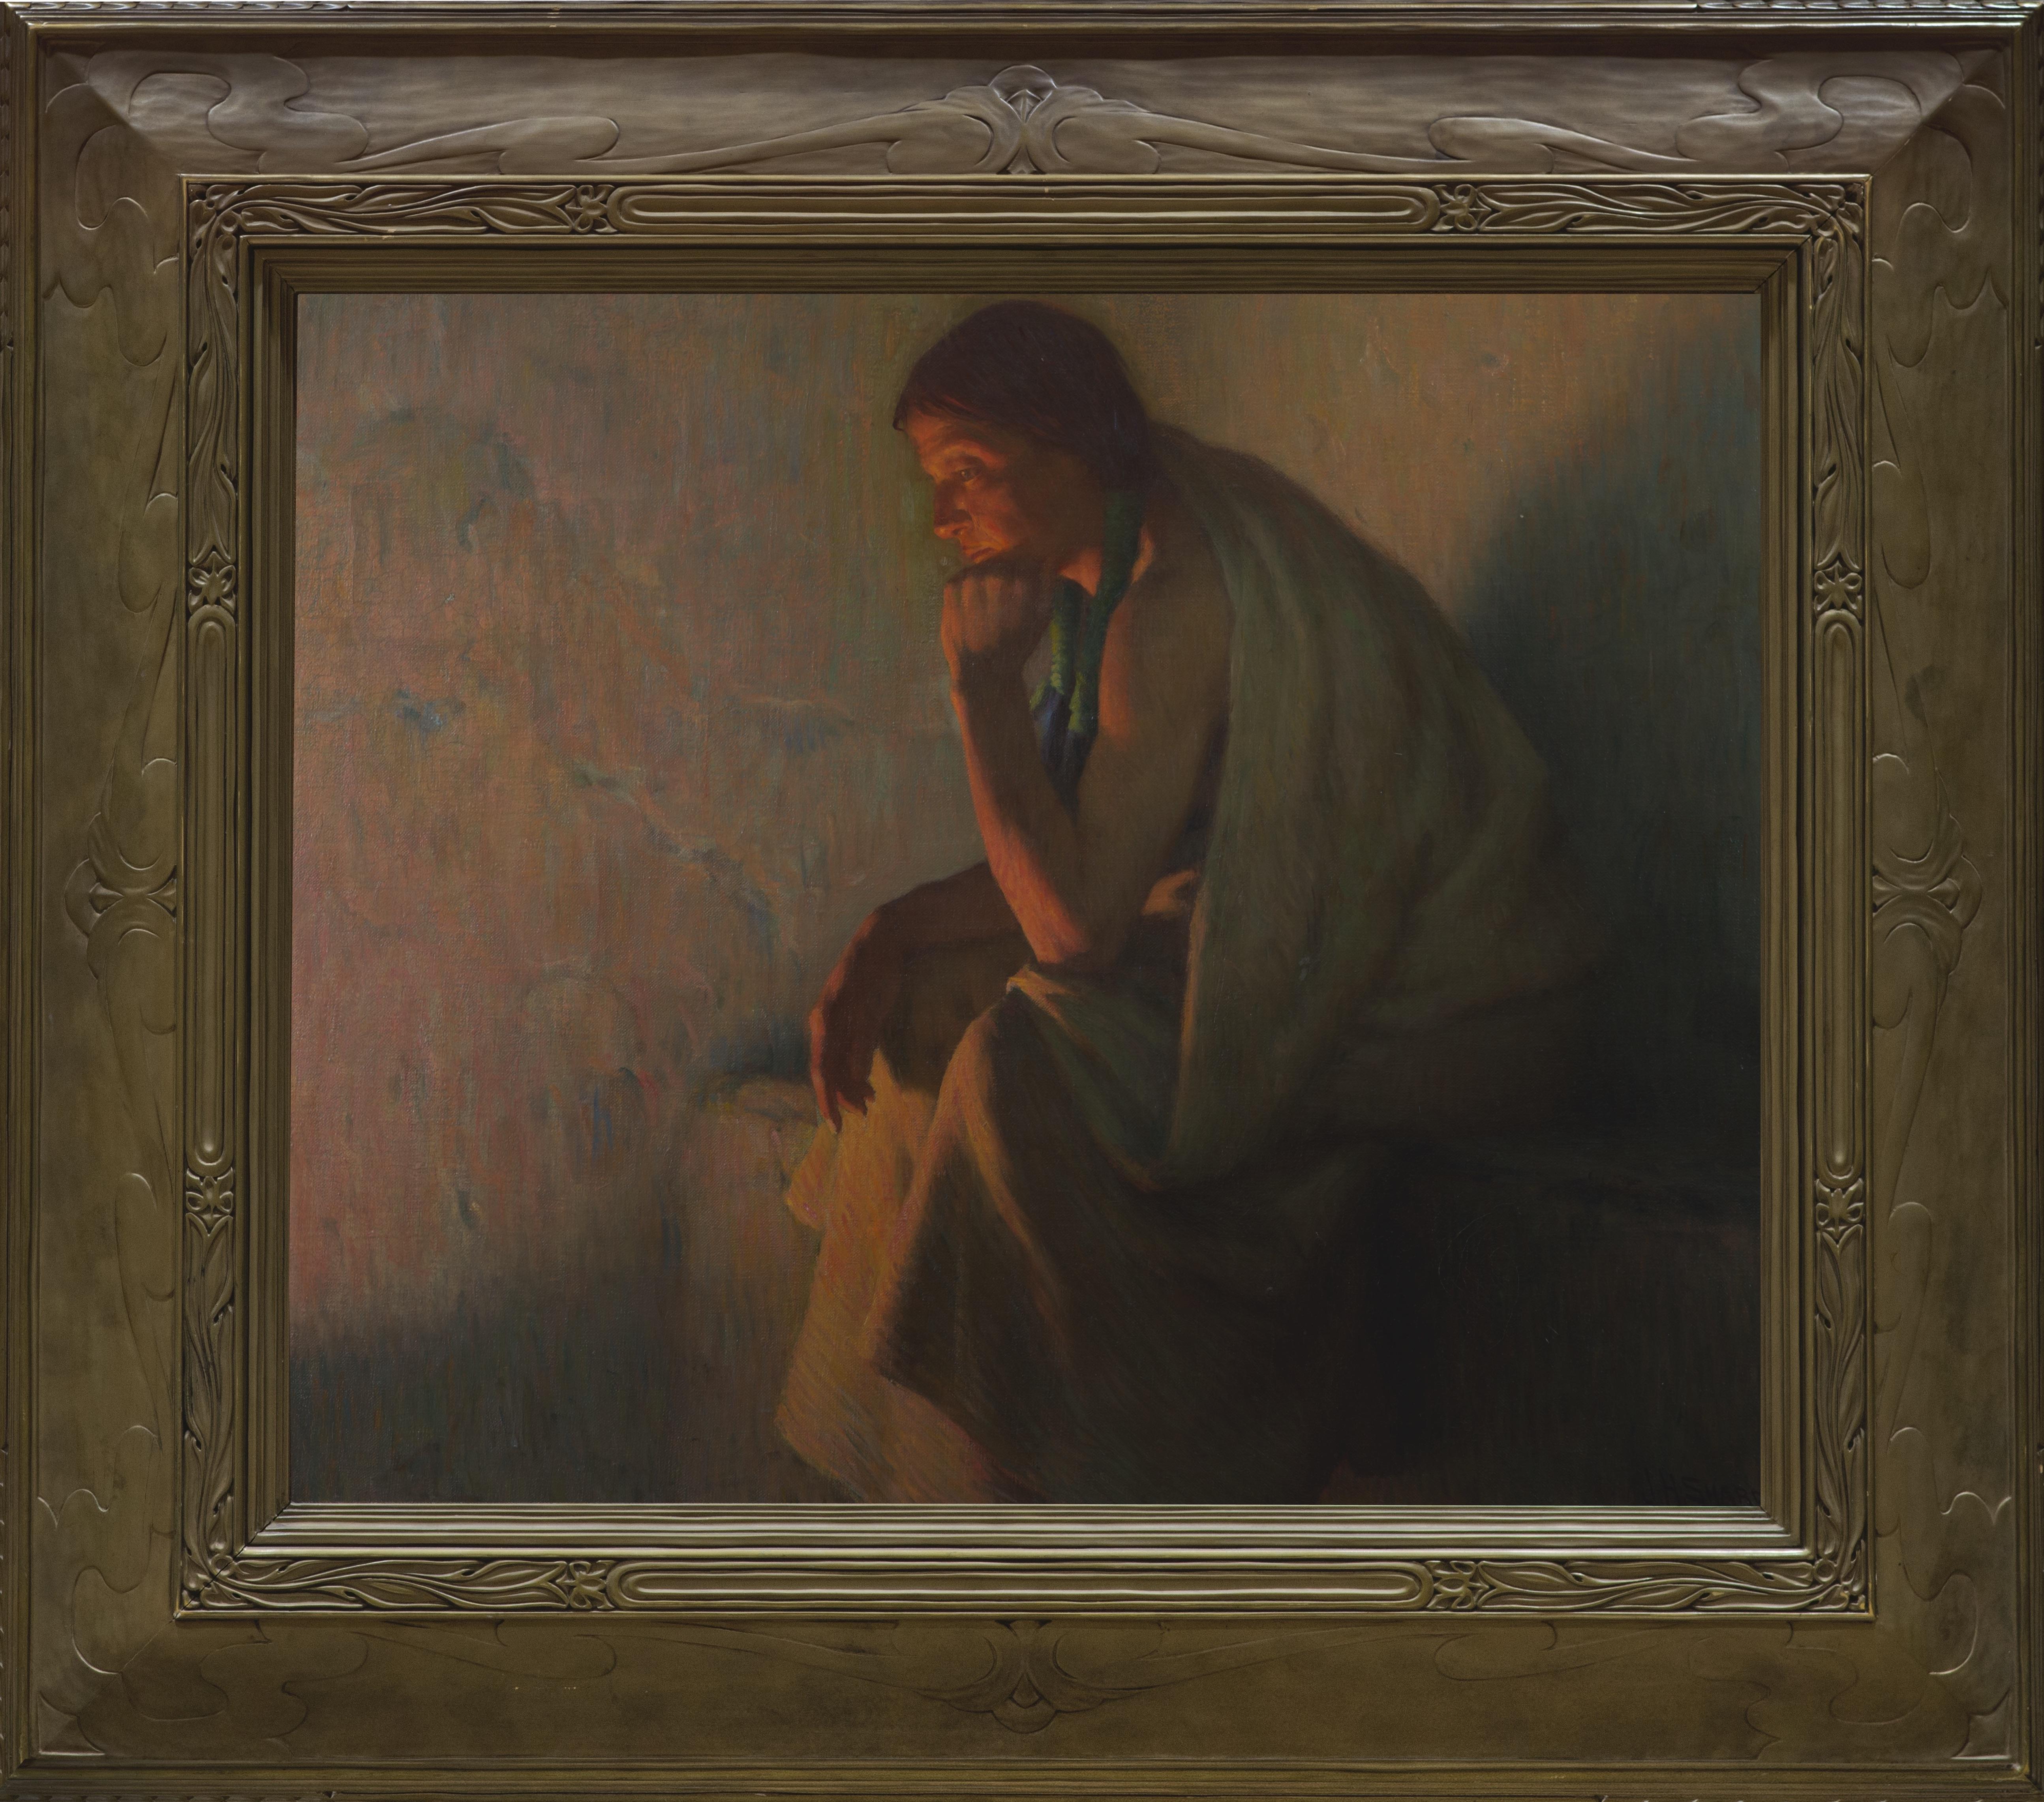 Joseph Henry Sharp, Indian by Firelight